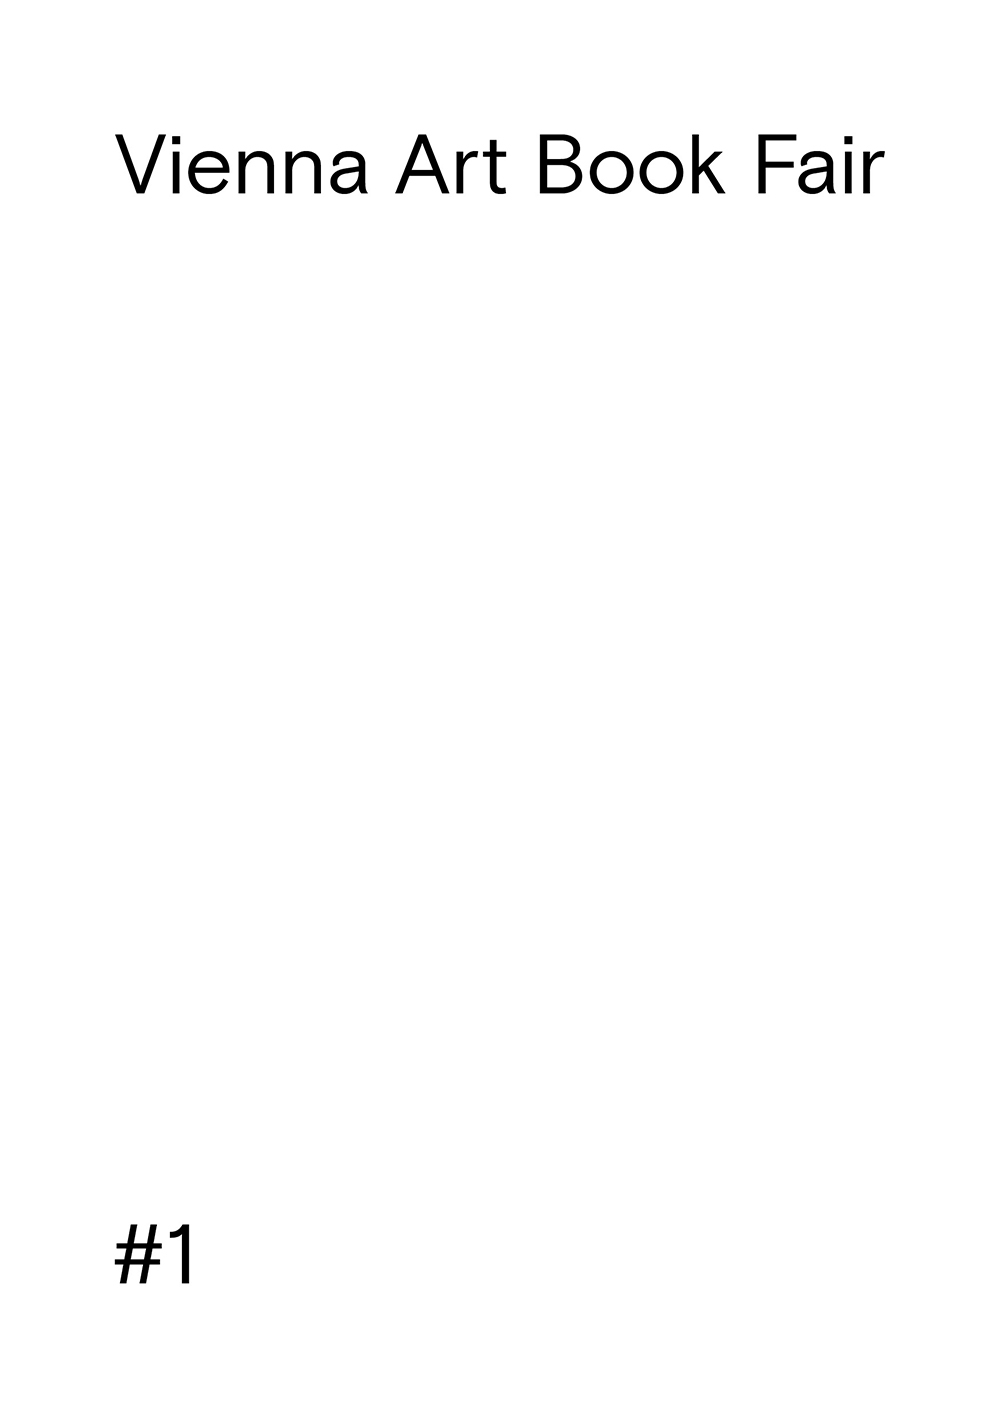 VABF-Einladung-01_2.jpg